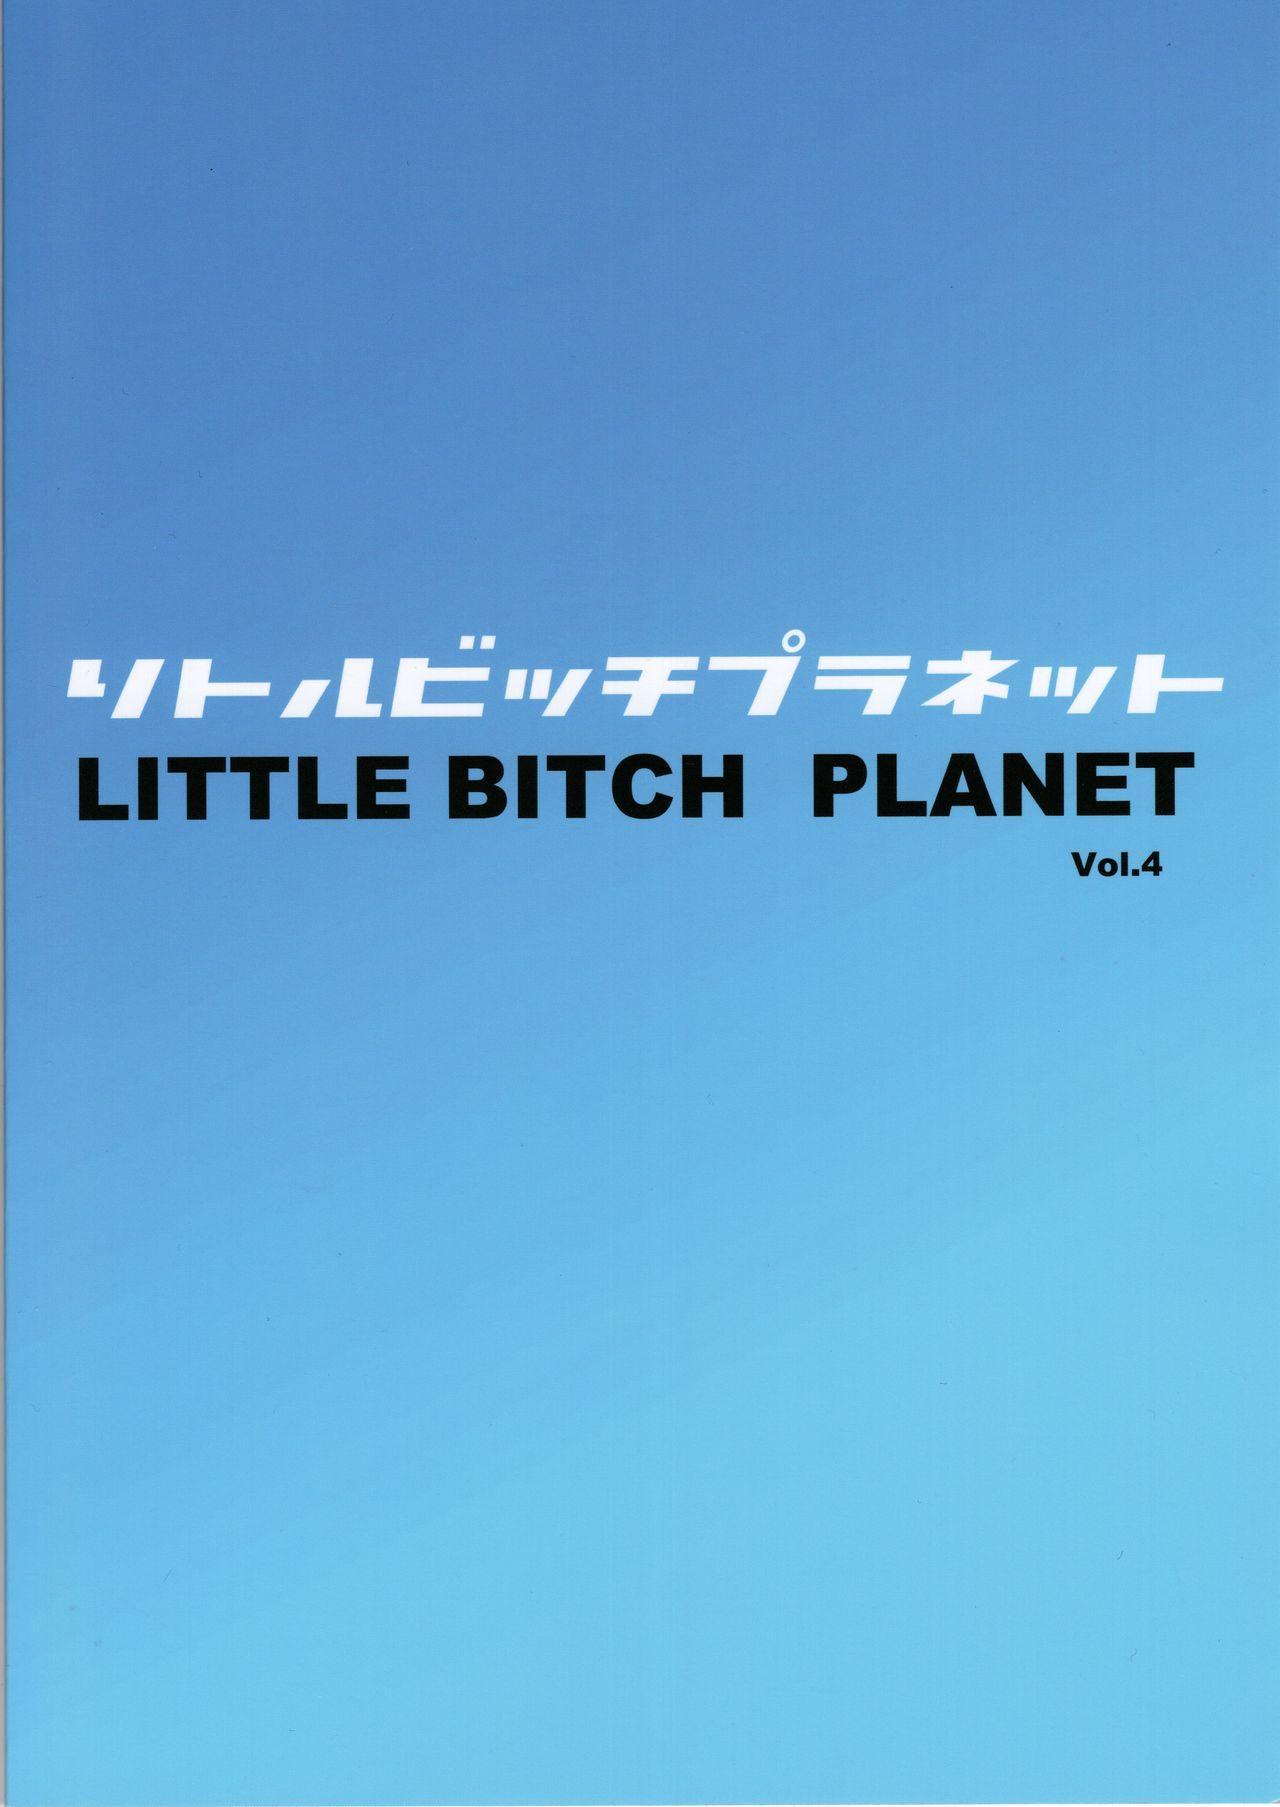 LittleBitchPlanet Vol. 4 + NKDC Vol. 11 27